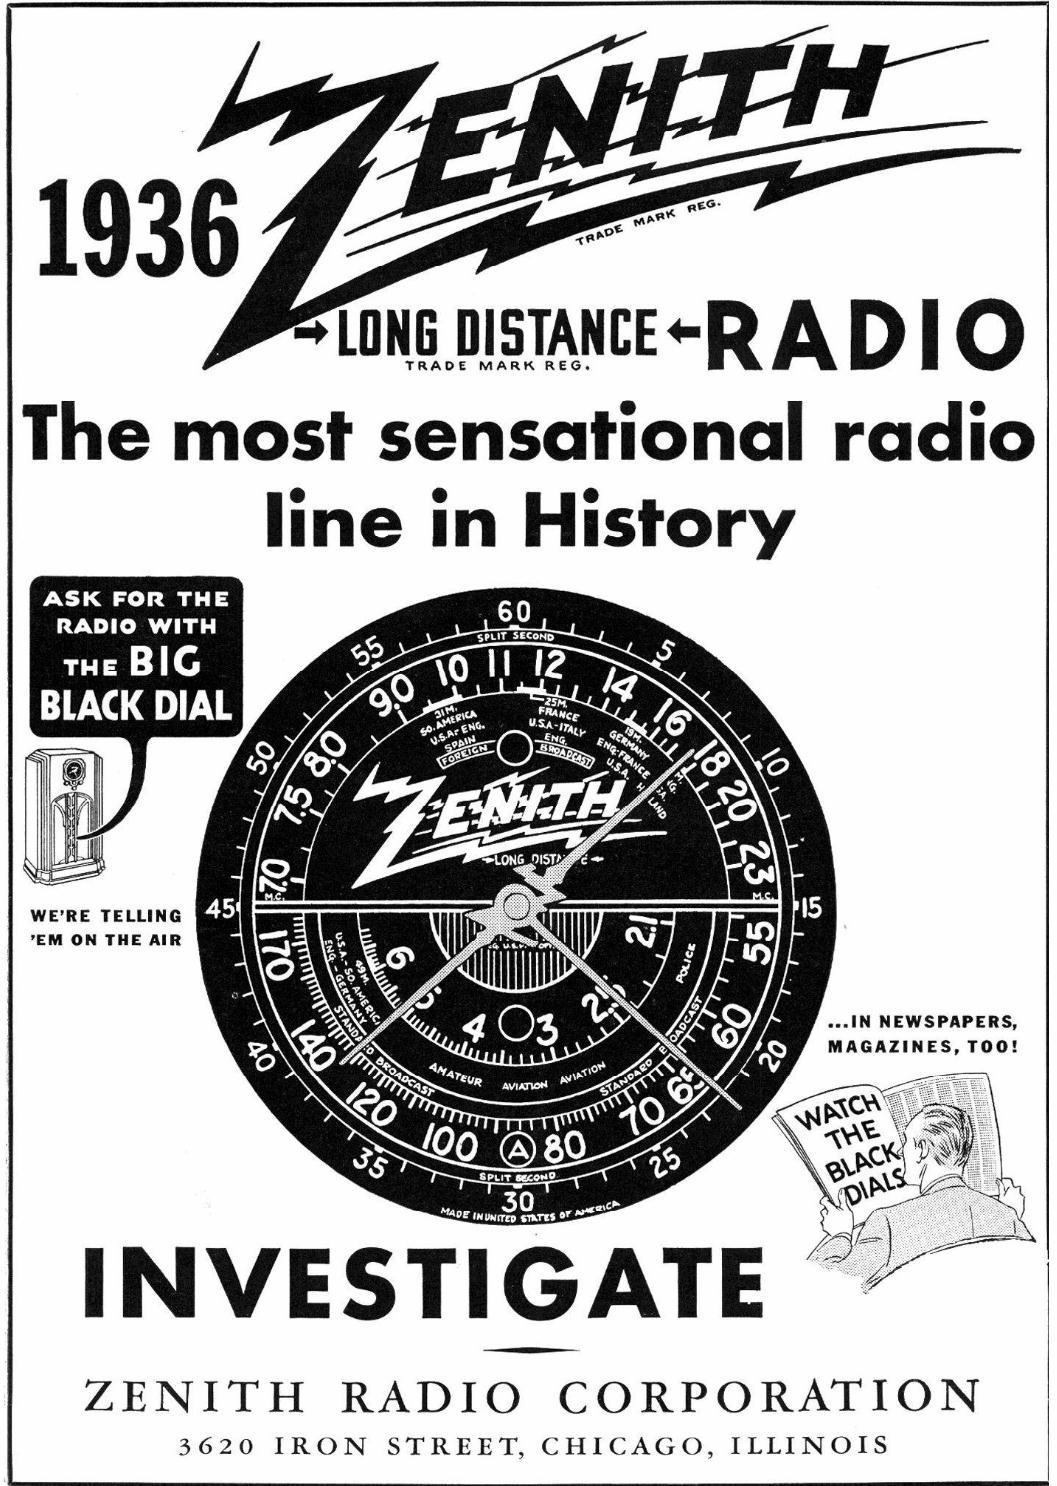 Zenith Model 9s30 Tombstone Radio 1936. Aug 1935 Radio Retailing Pg 1. Wiring. Zenith Tube Radio Schematics 10g 130 At Scoala.co